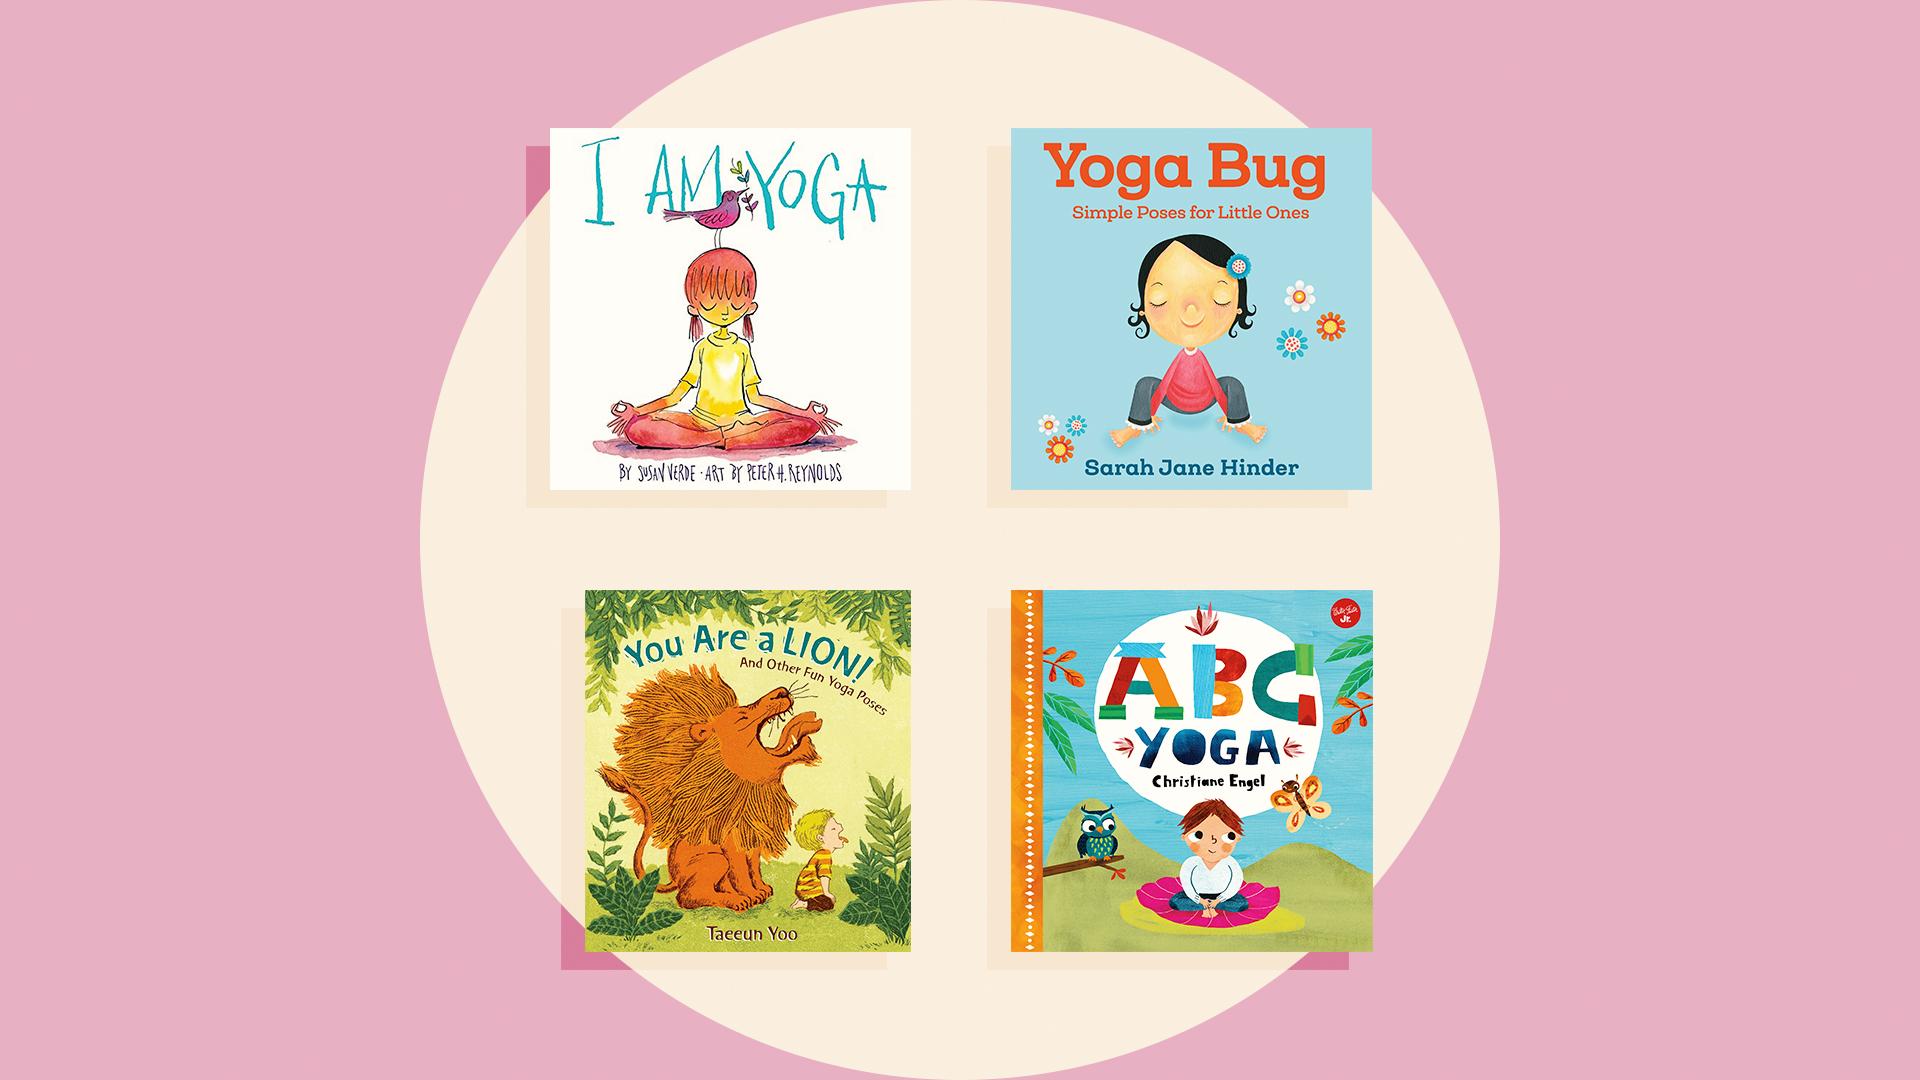 The Best Yoga Books For Kids Yoga Mindfulness Children S Books Sheknows